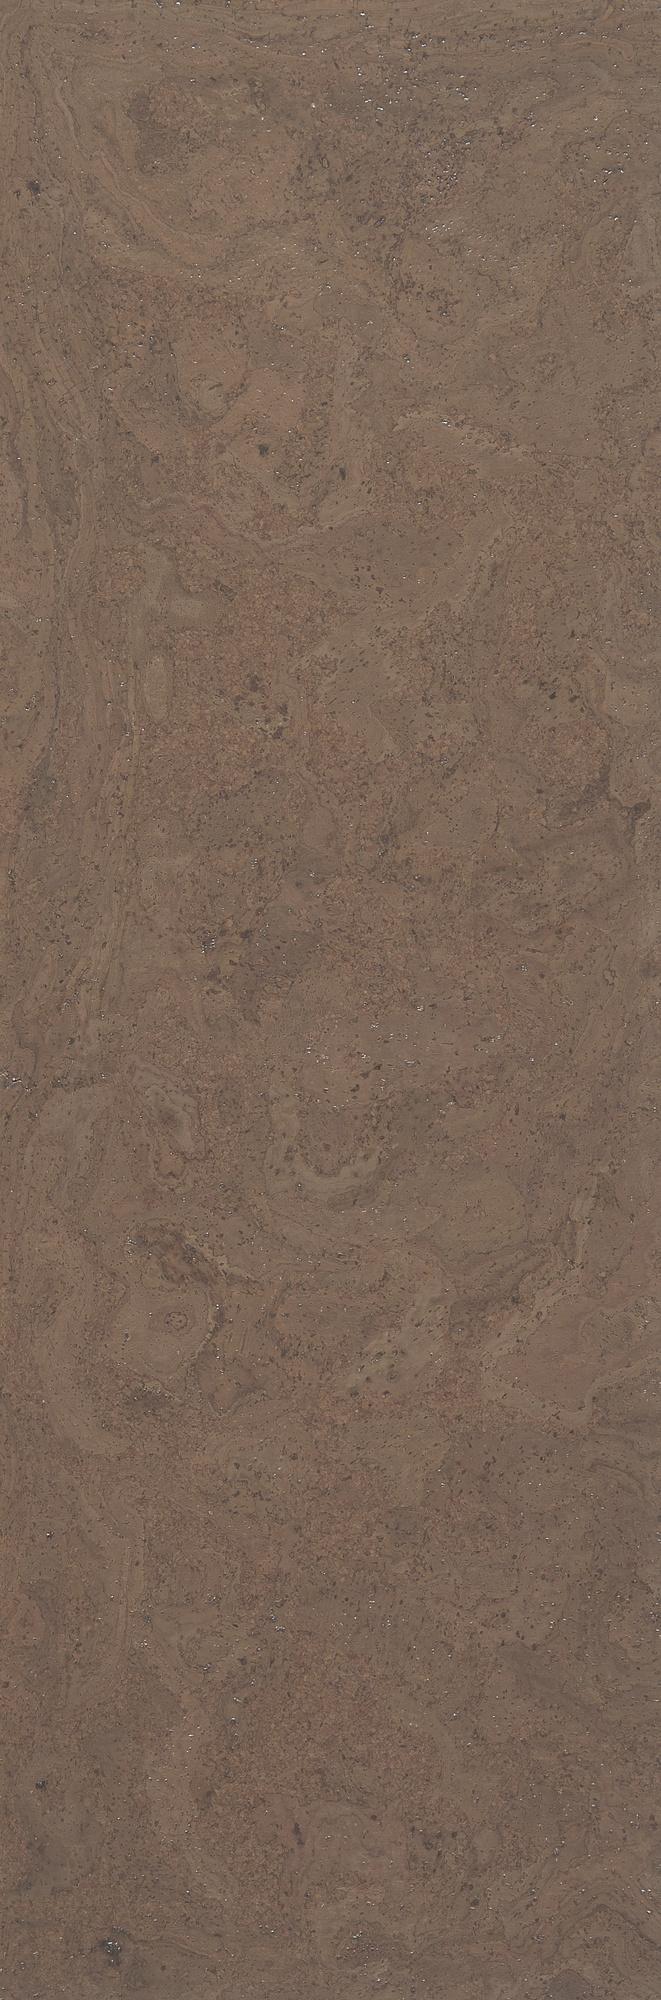 Spring brun gris